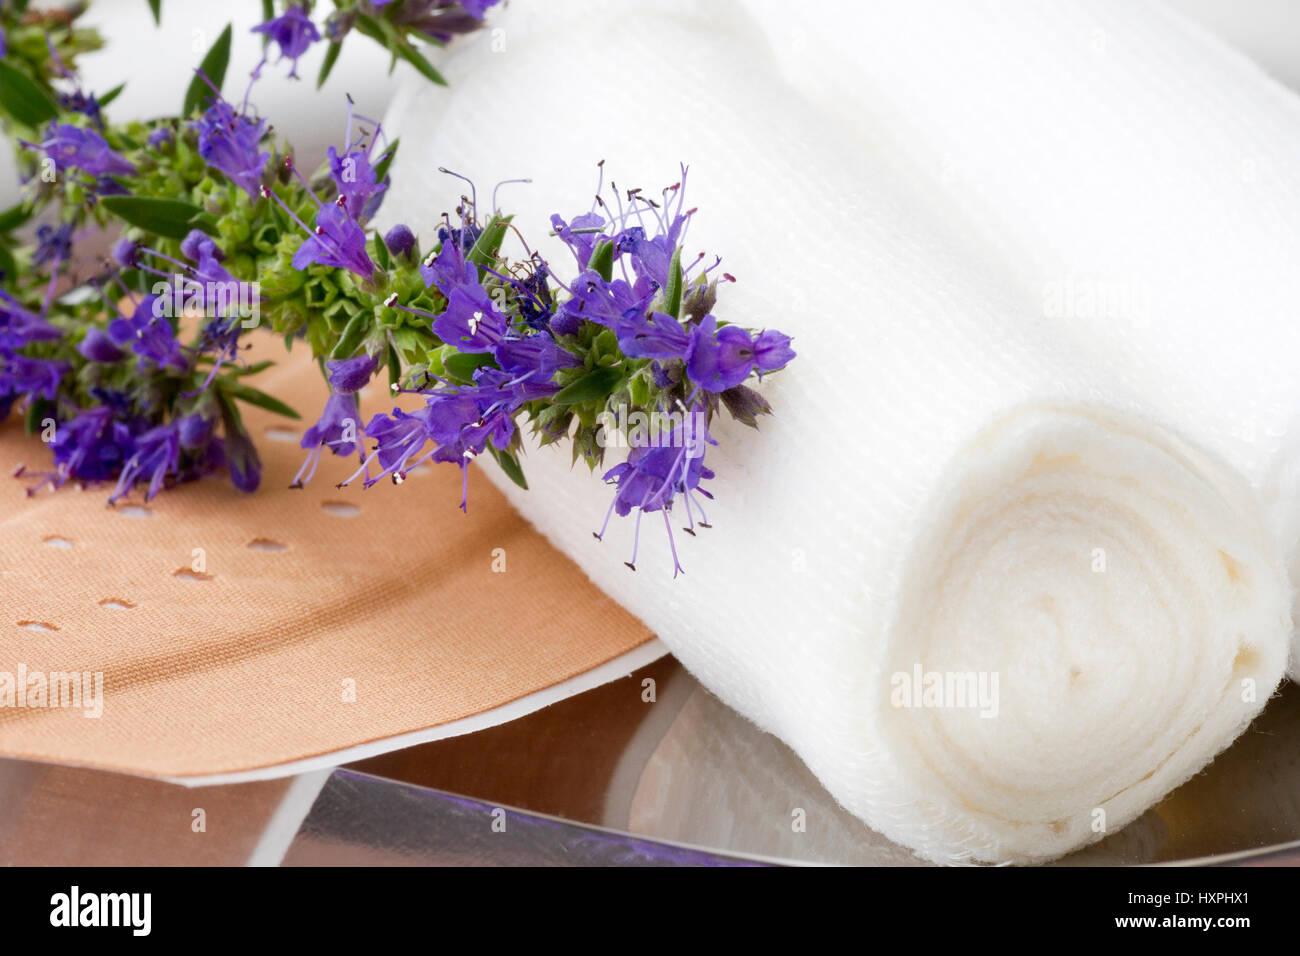 Ysop (Hyssopus officinalis) beside association material, helps in wounds, Ysop (Hyssopus officinalis) neben Verbandmaterial, - Stock Image